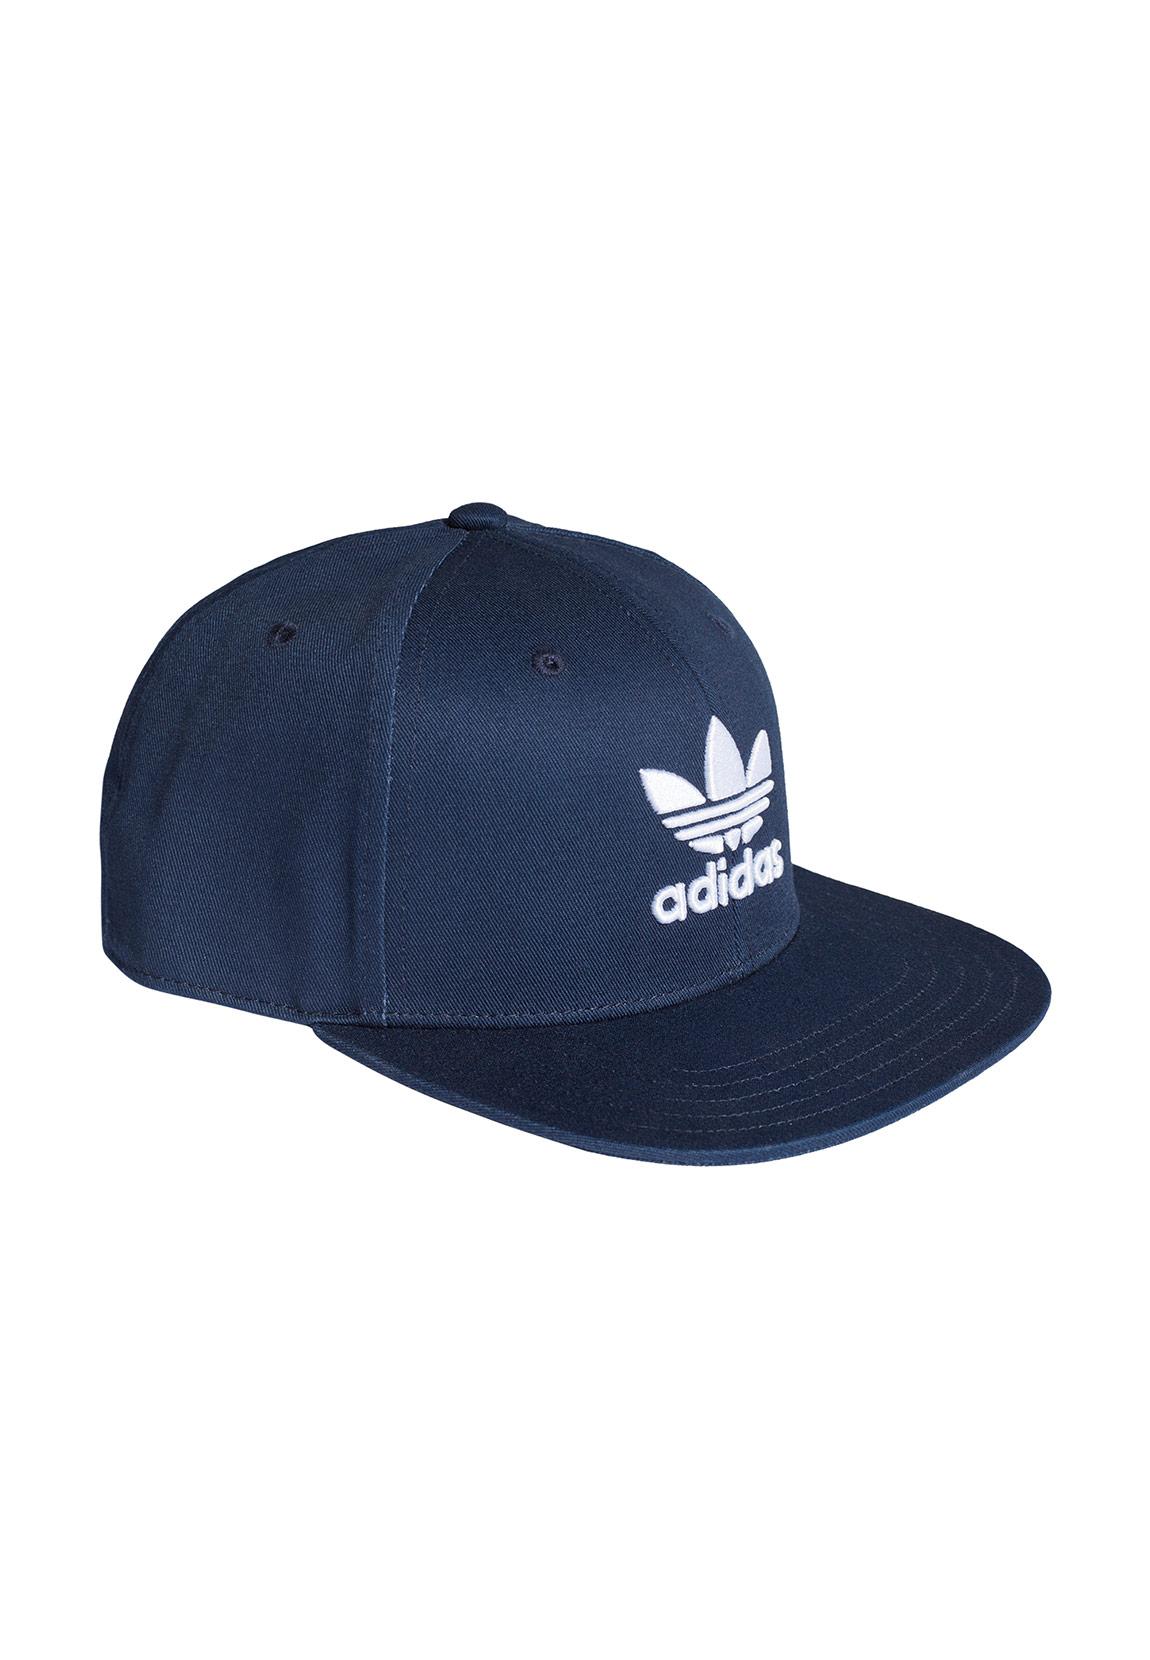 Details about Adidas Originals Snapback Sb Classic Tre ED9380 Dark Blue